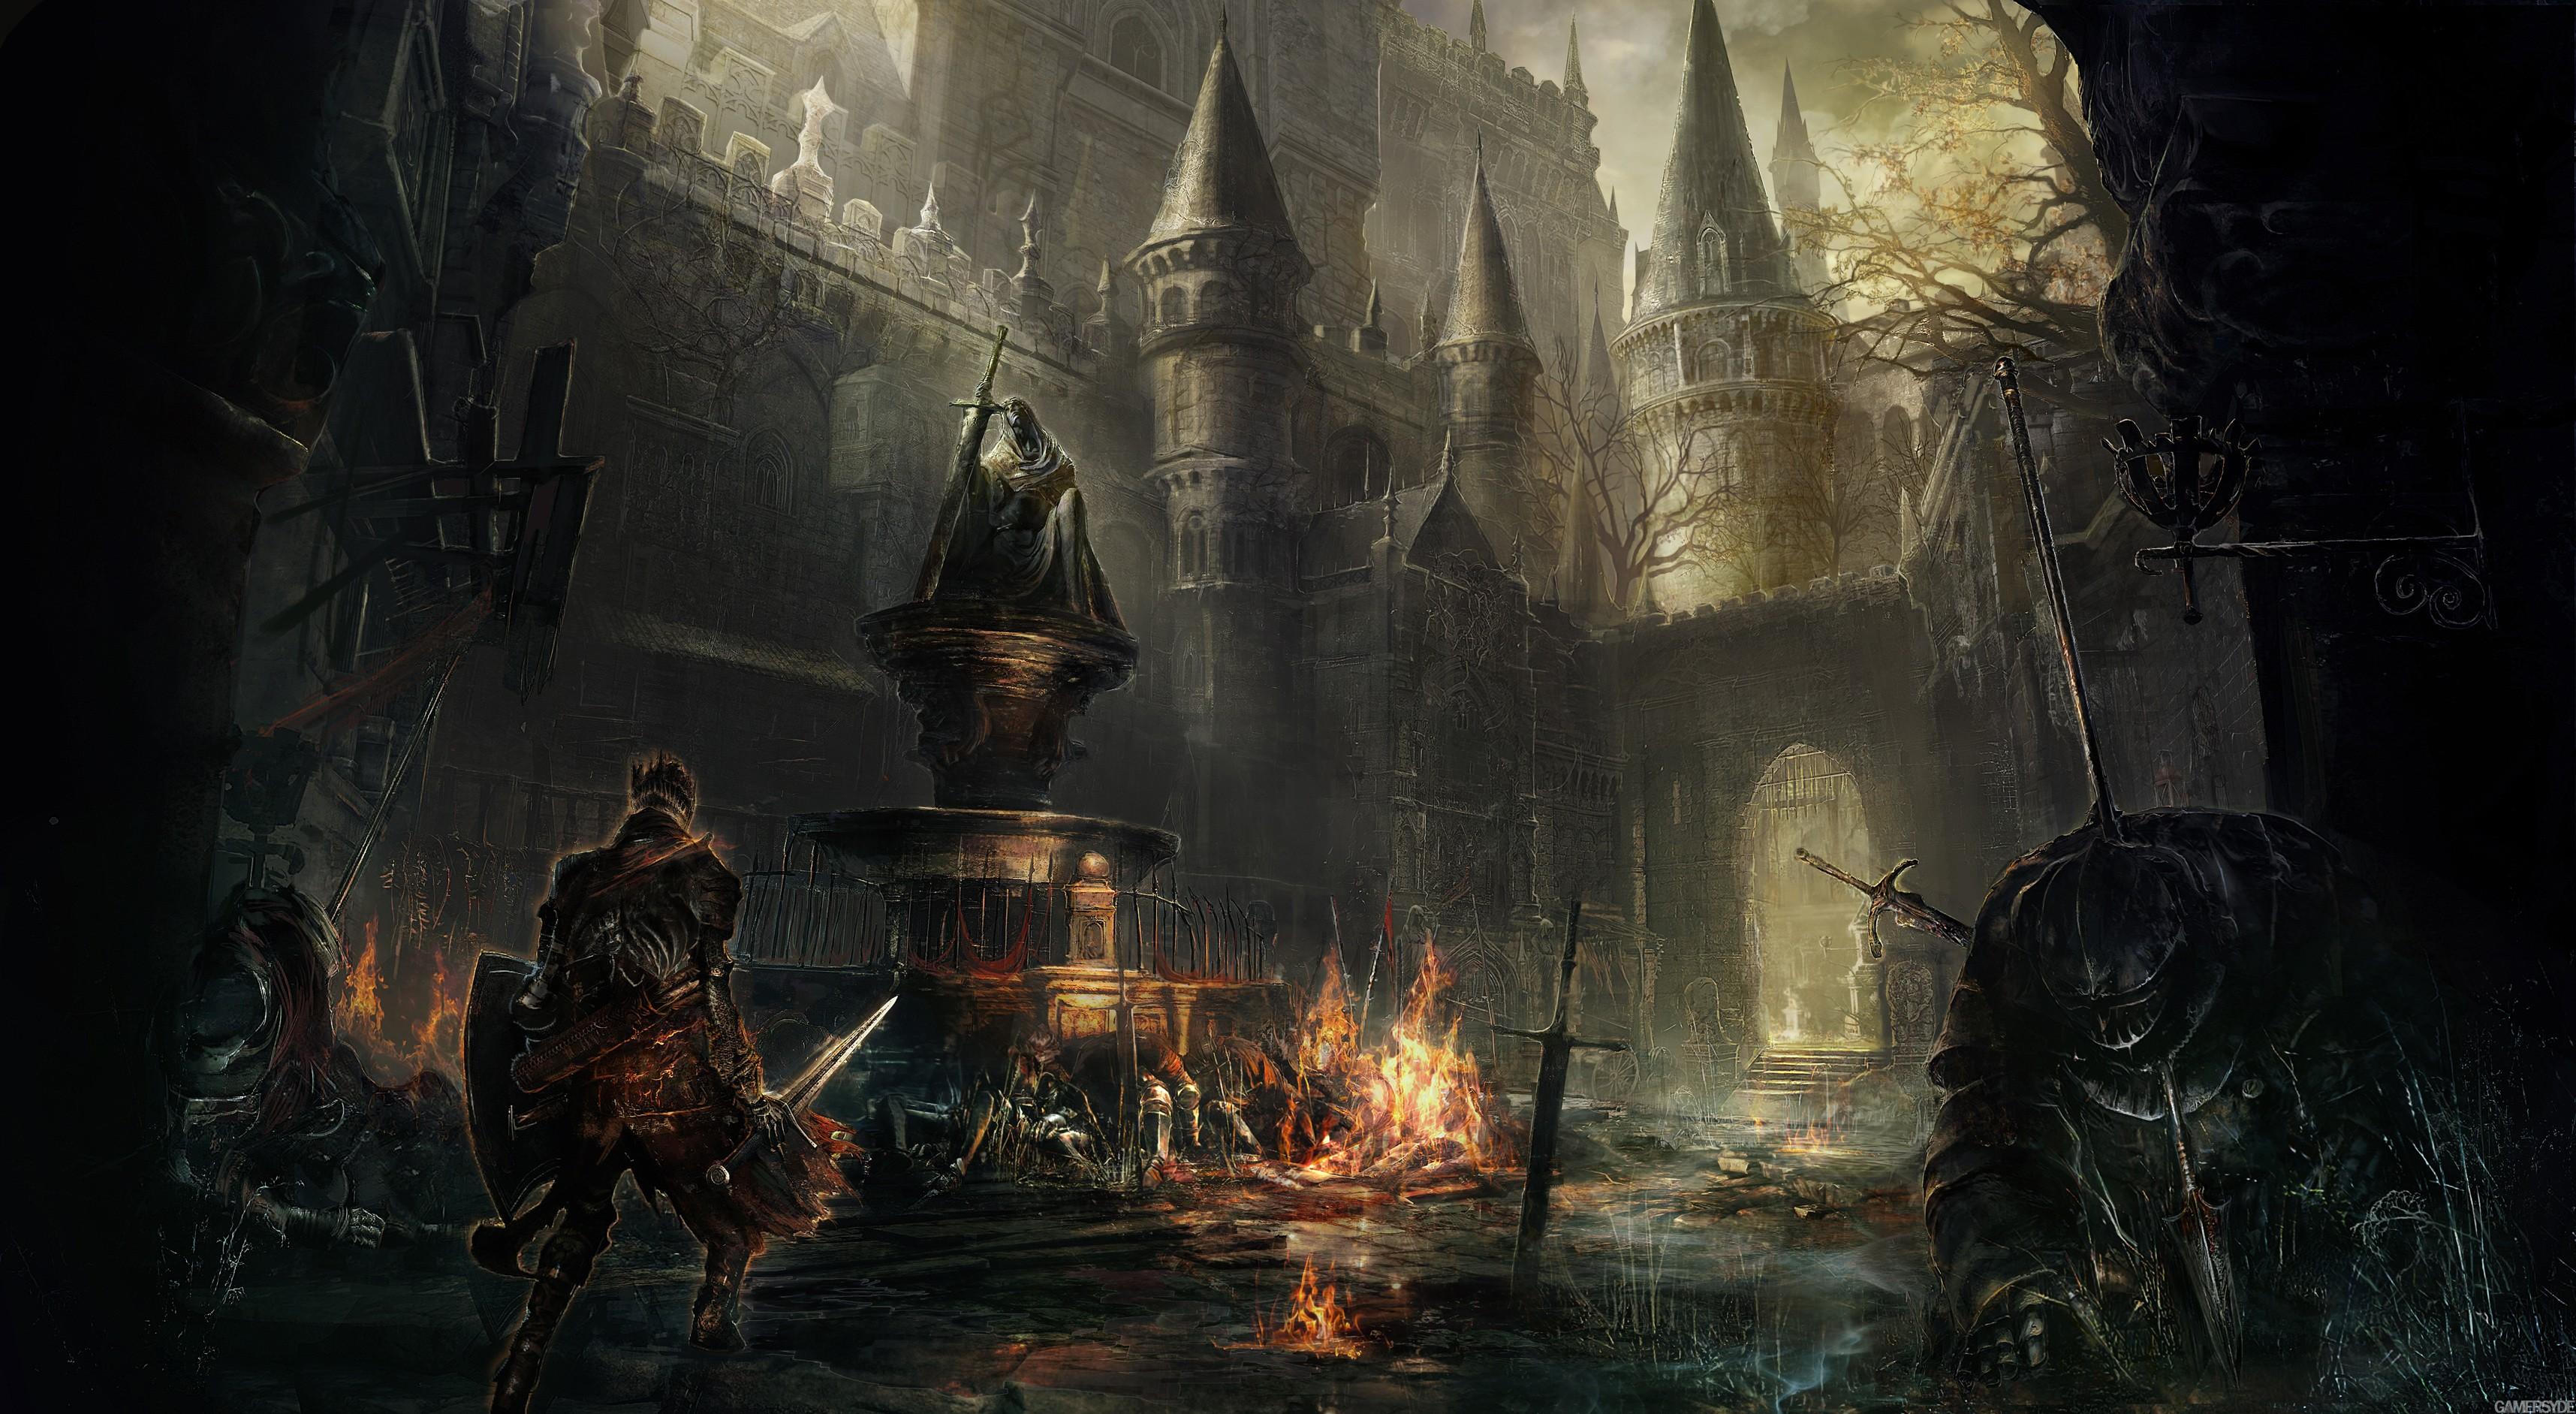 art dark souls 3 best games 2015 game fantasy pc ps4 xbox one